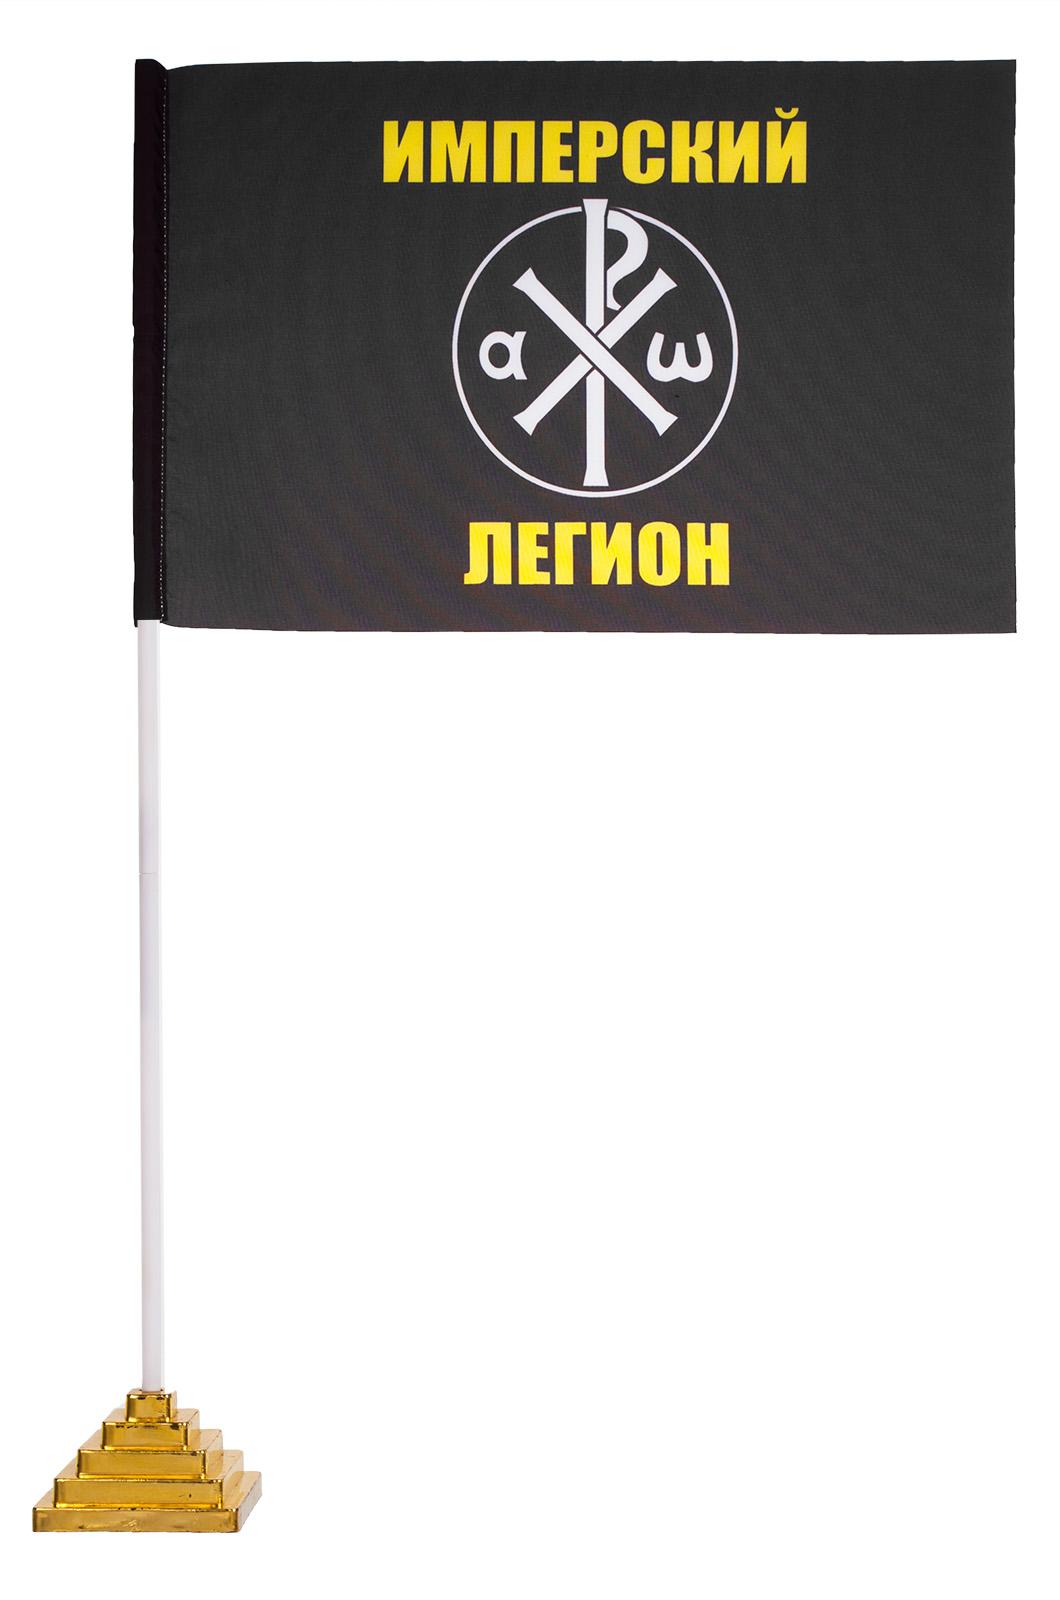 Флаг Имперского легиона